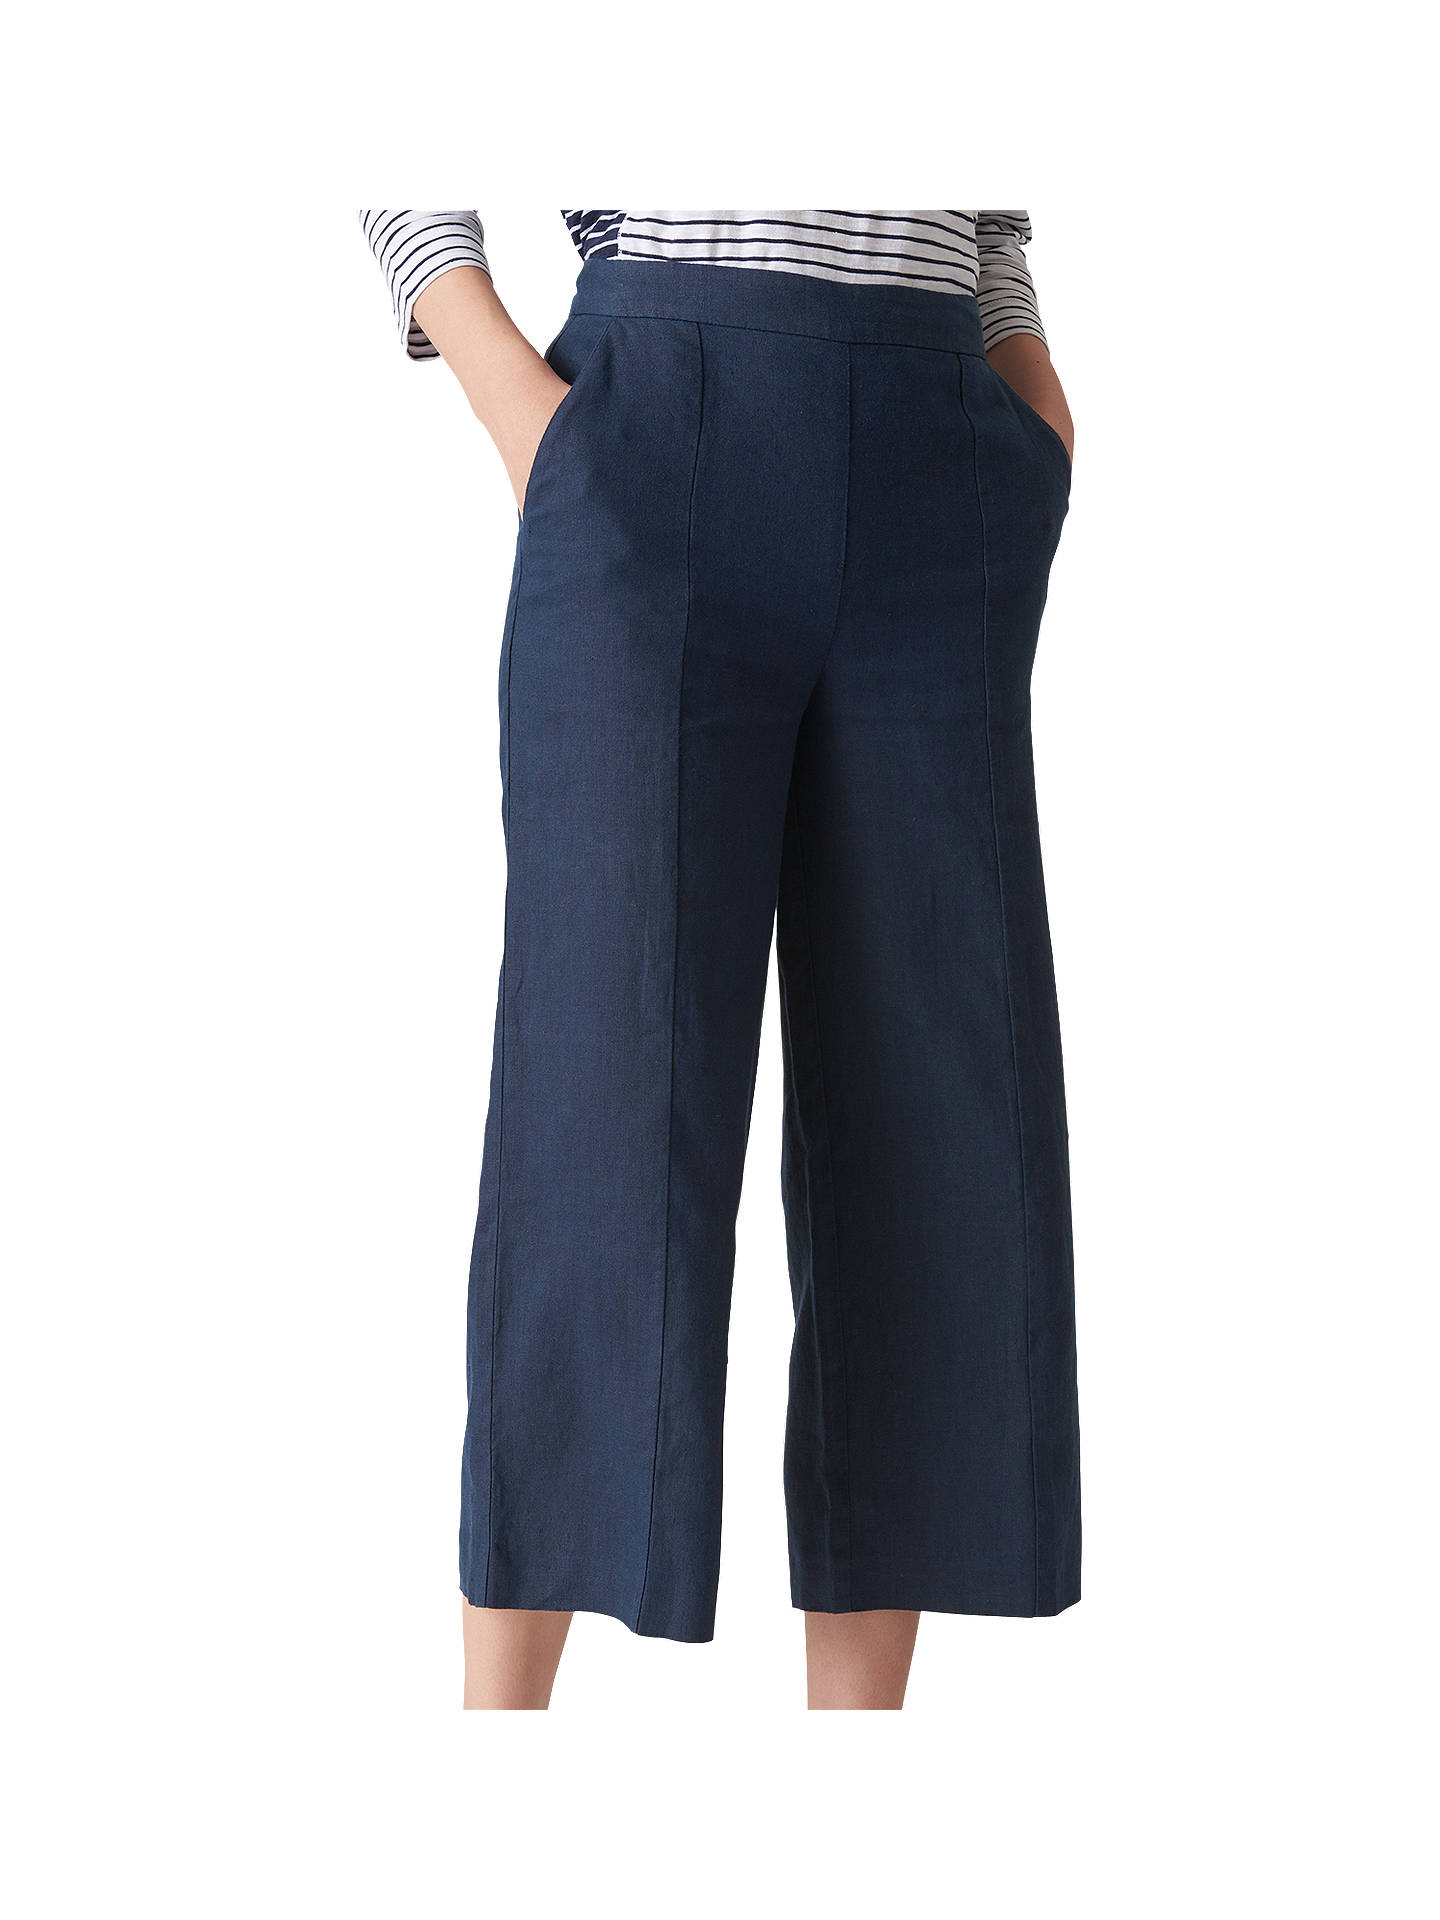 21565624ba Buy Whistles Linen Trousers